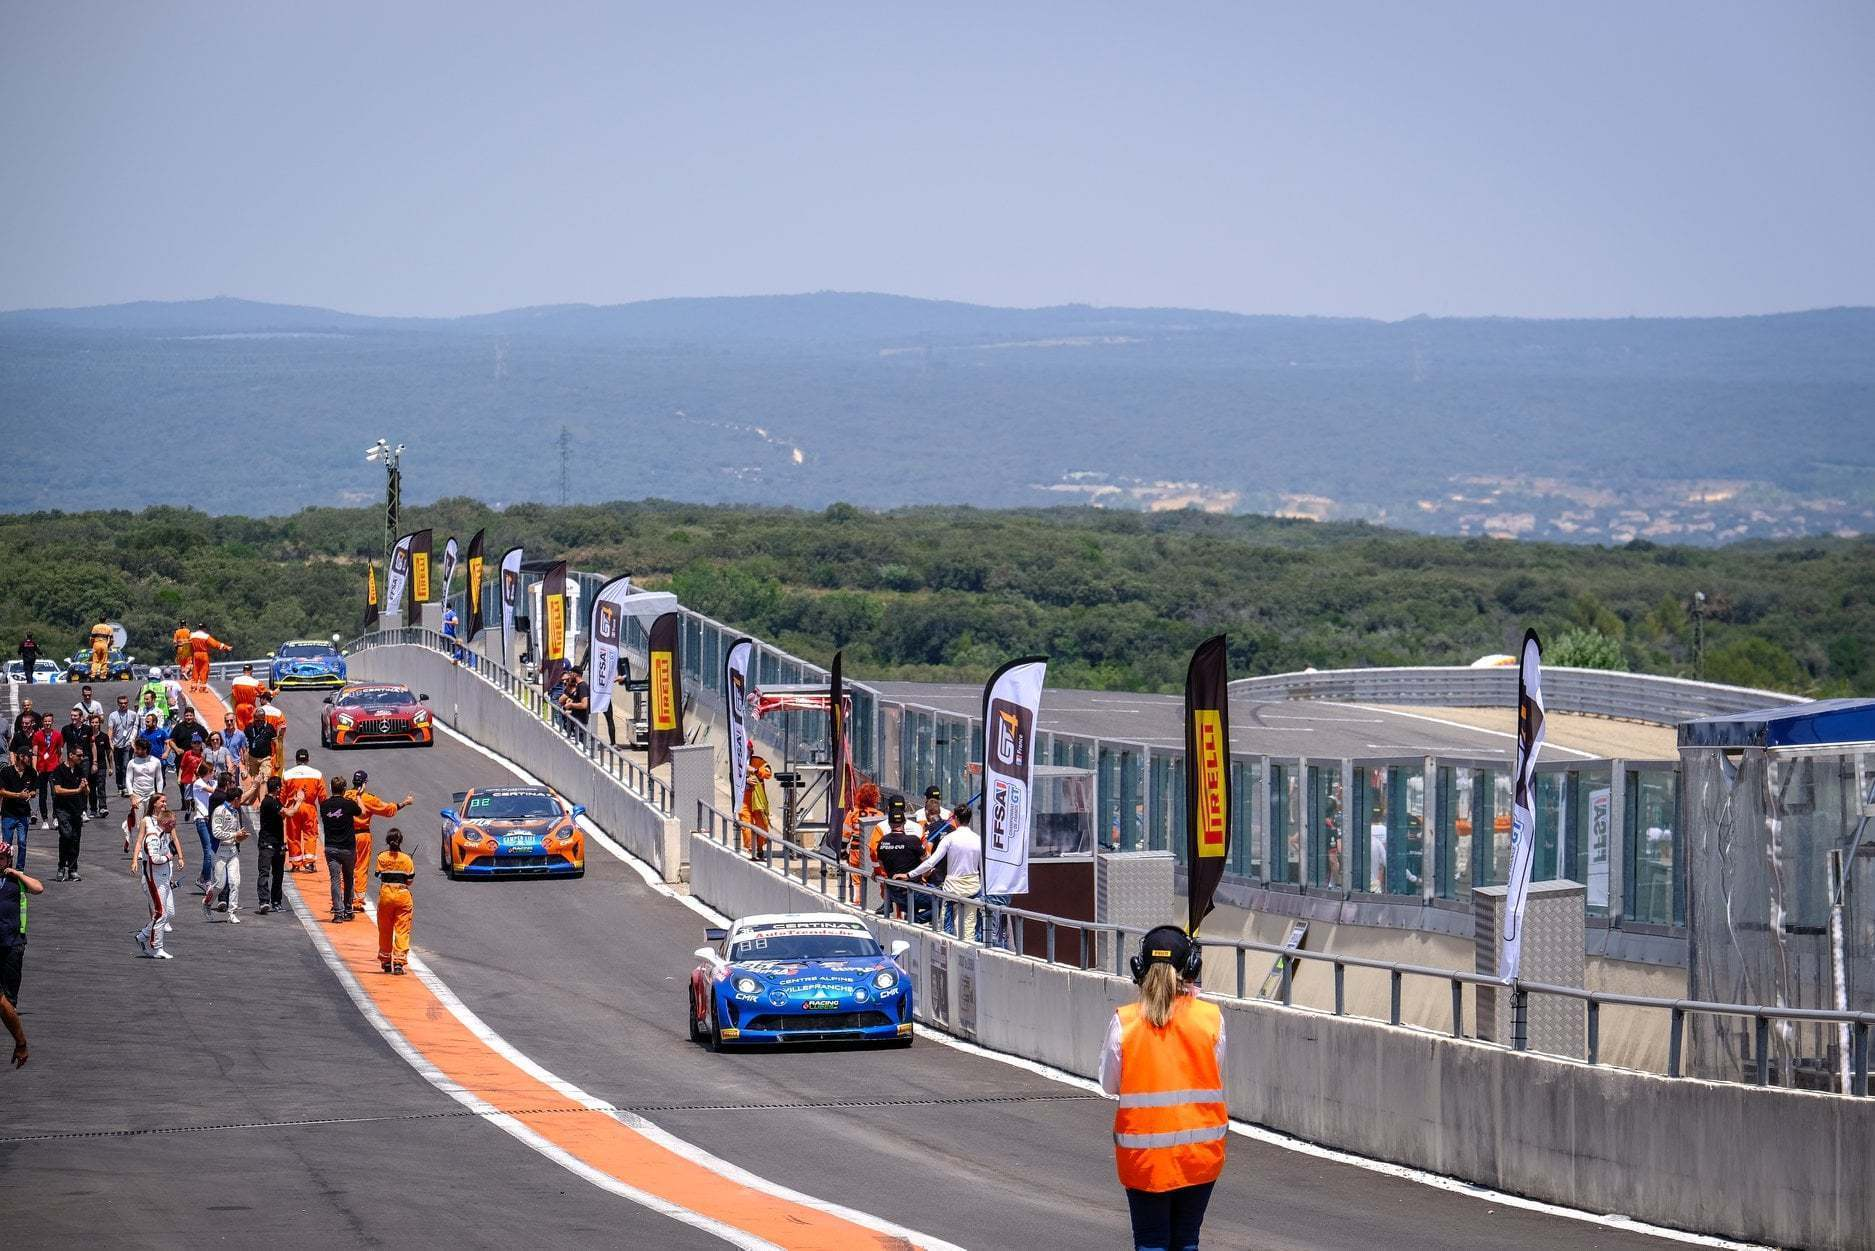 FFSA GT: CMR reprend la main Lédenon ! (Course 2) 12